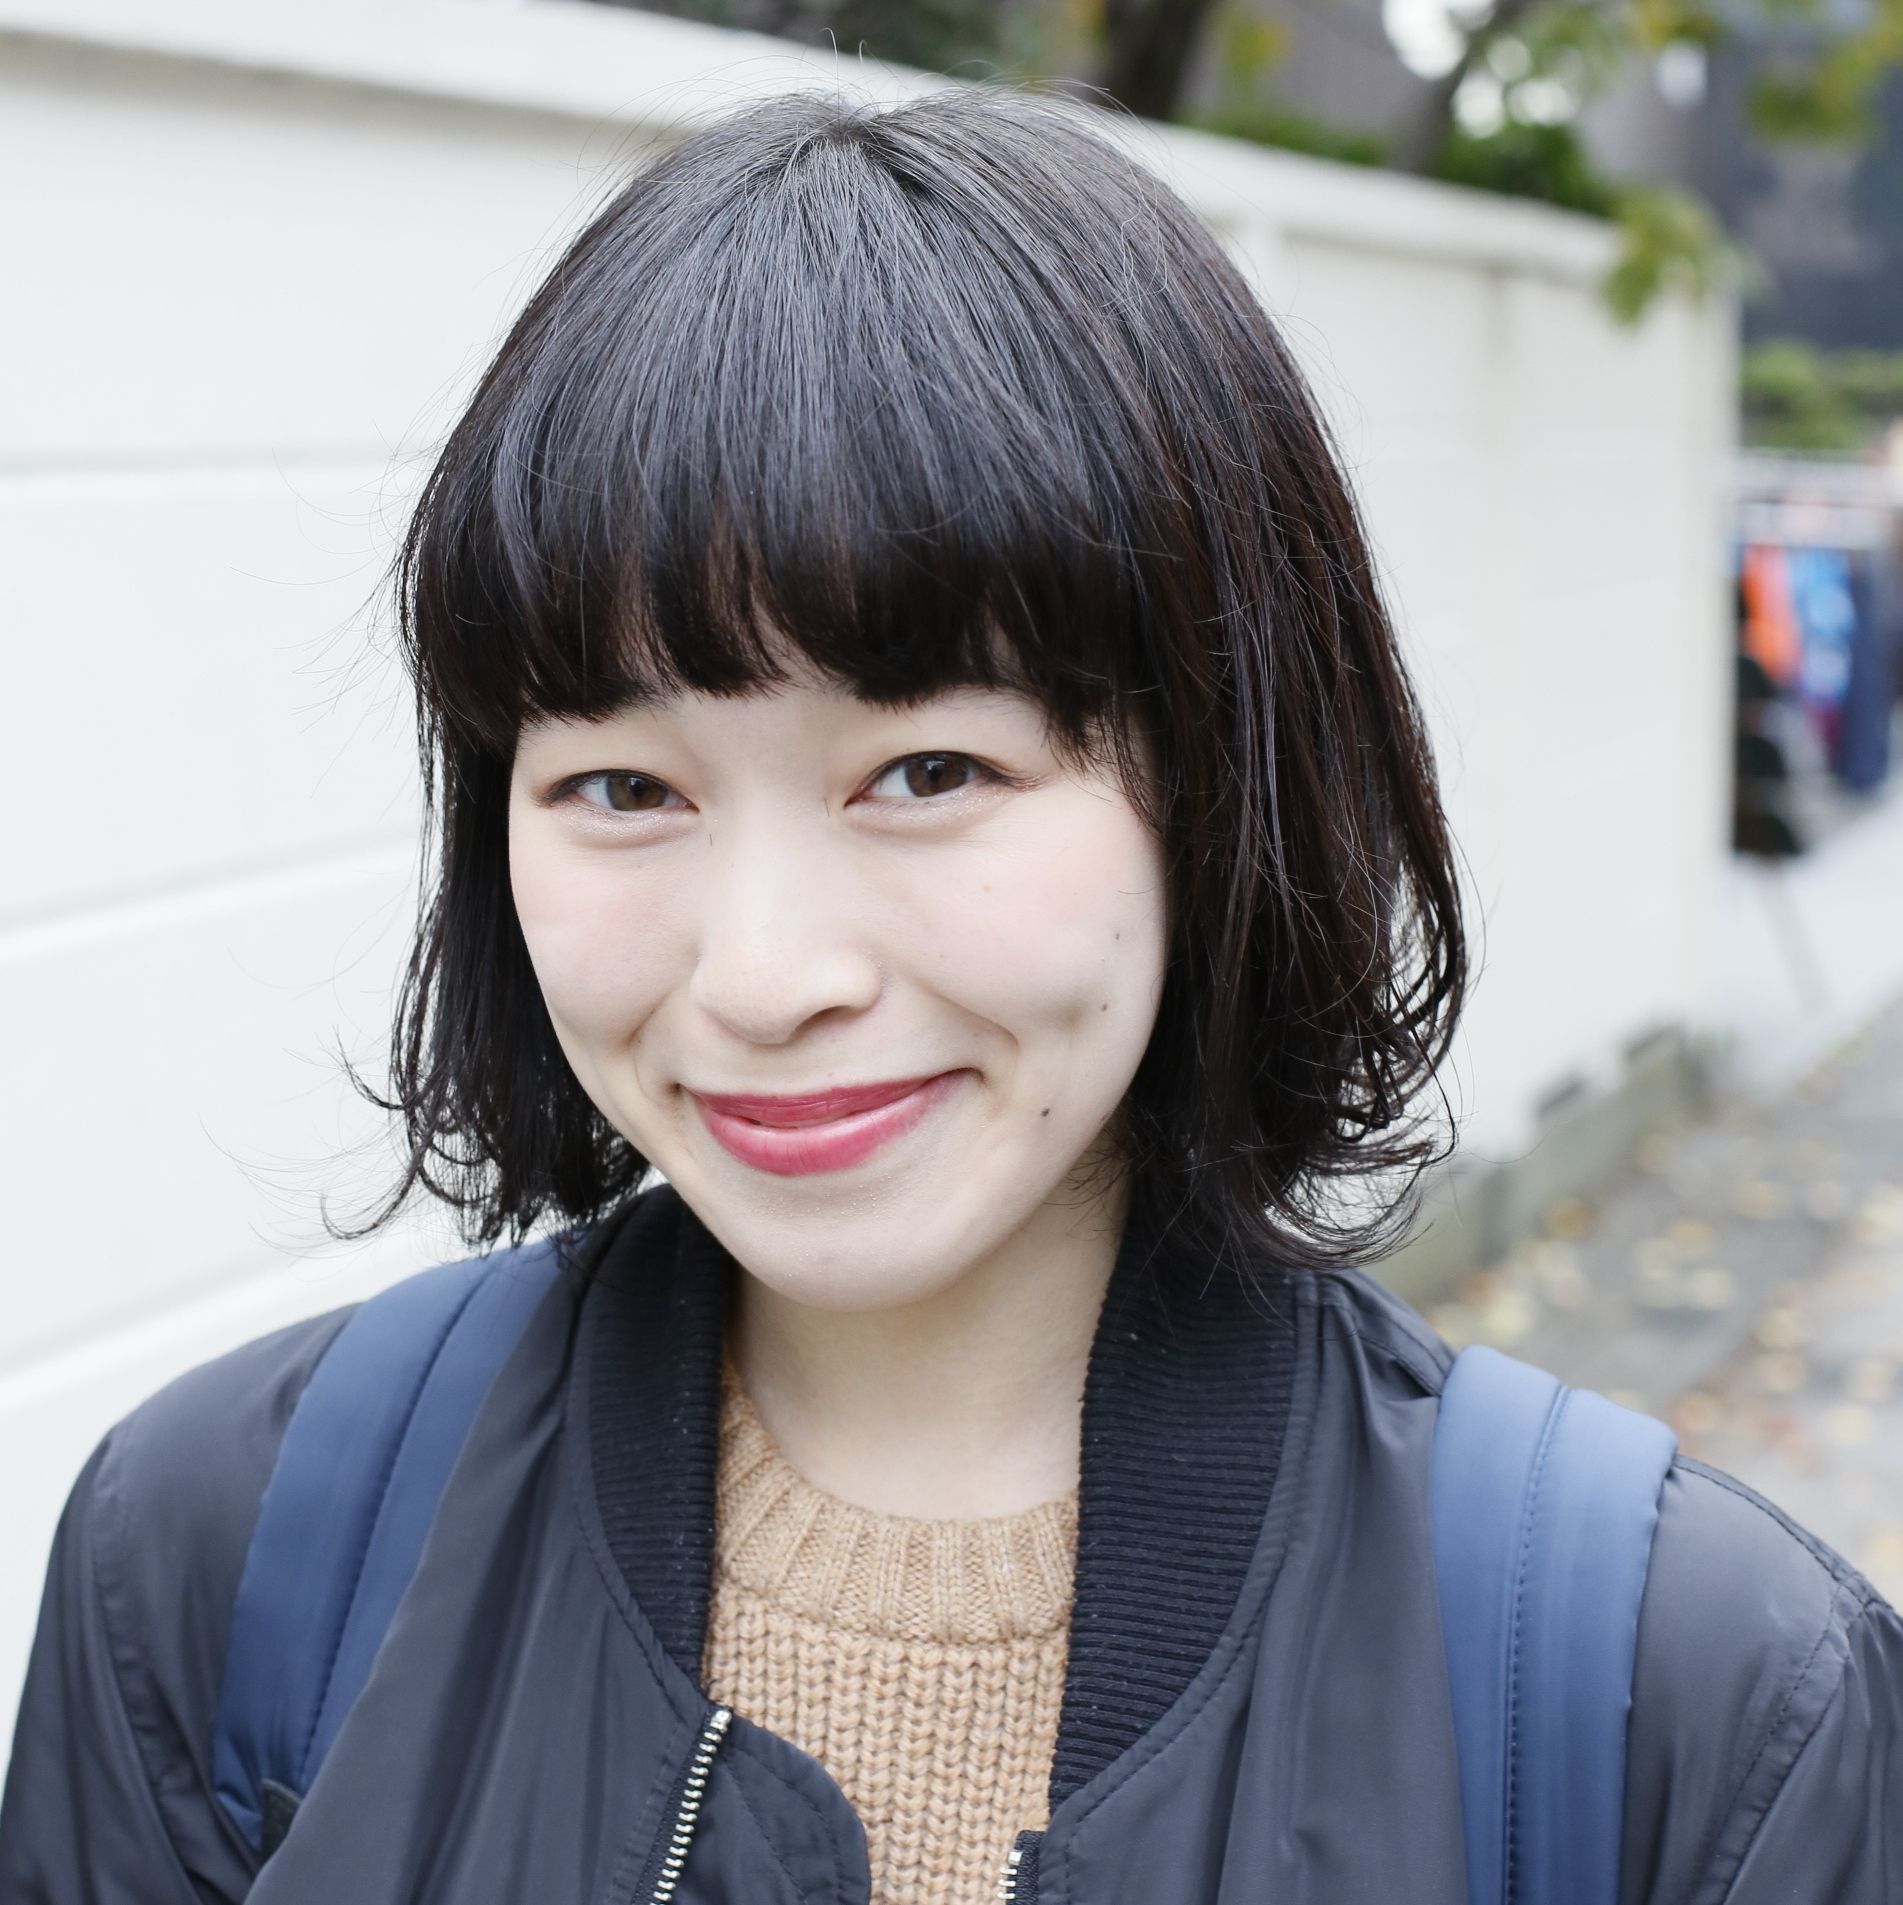 【女子SNAP】SJ美女図鑑<br />髙橋莉奈さん・駒澤大学<br />